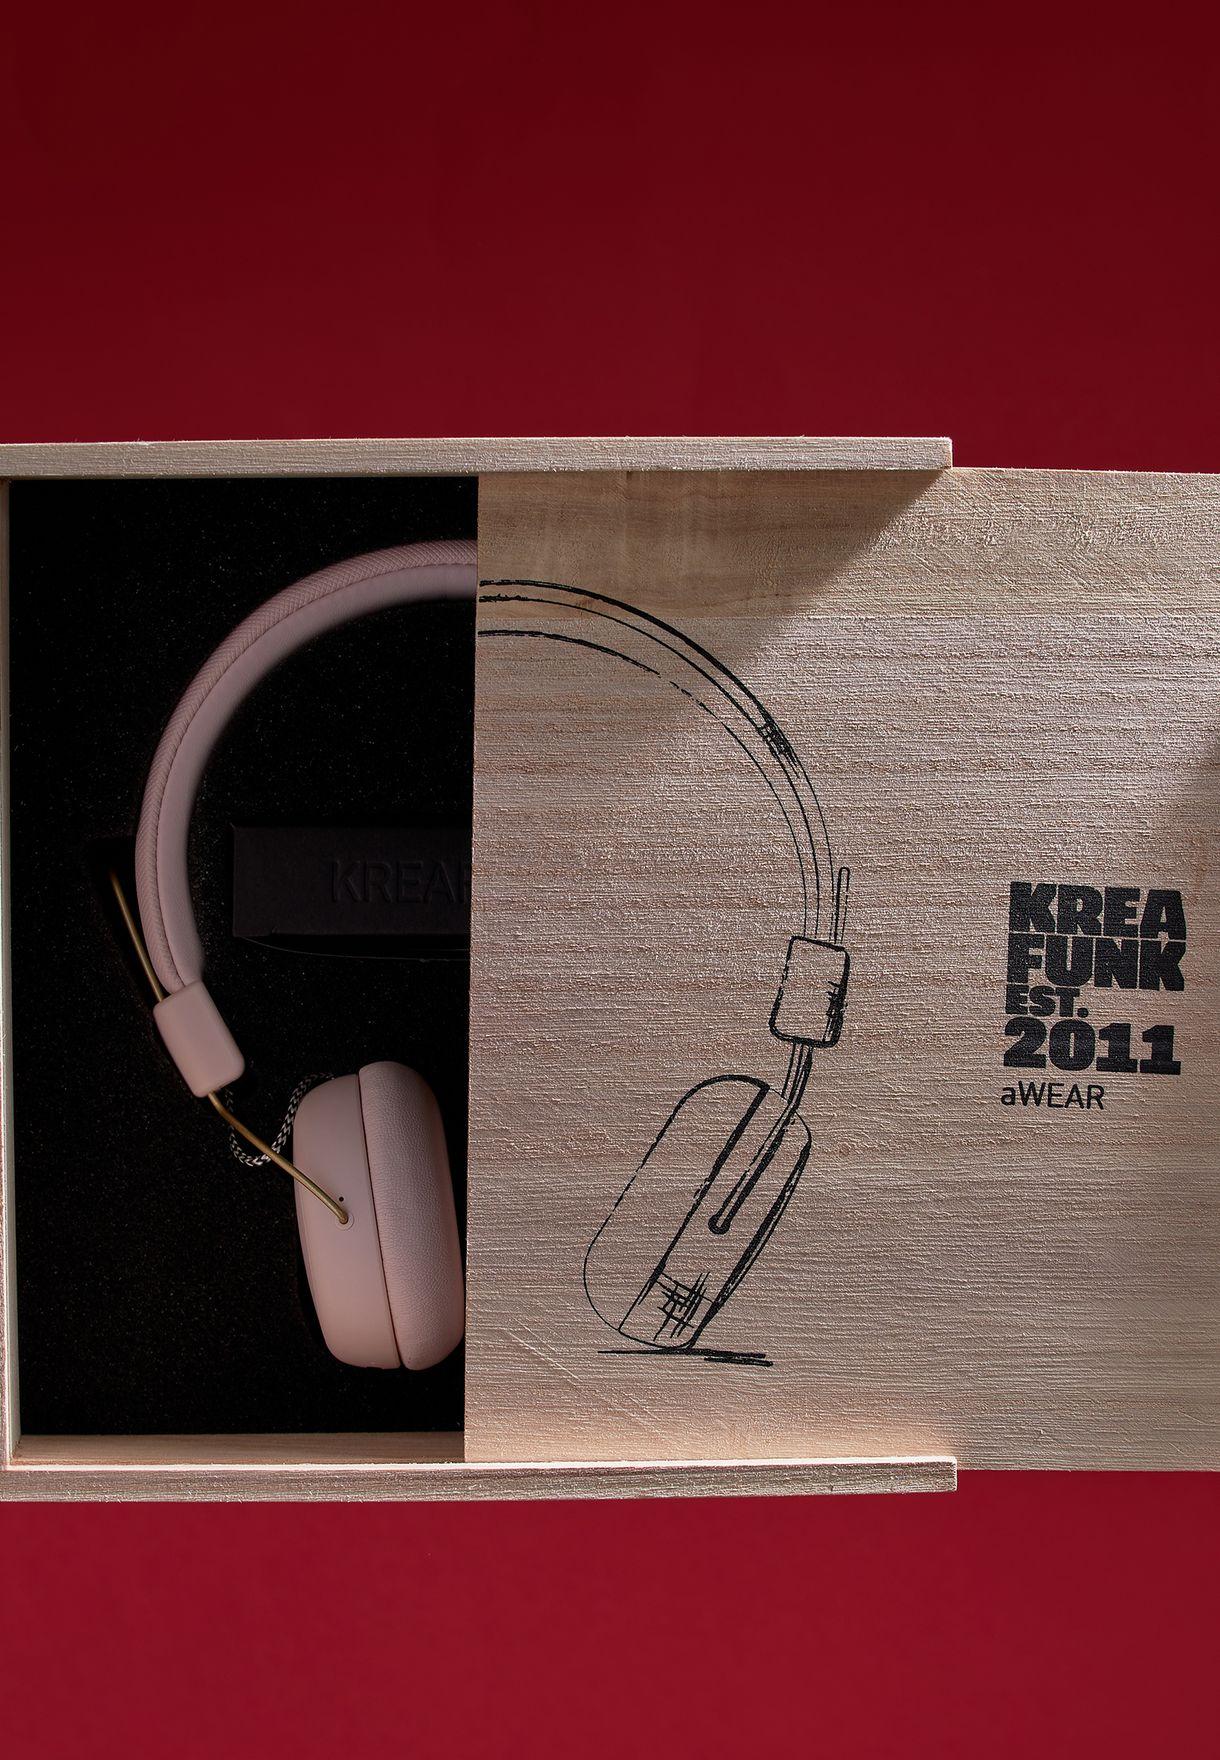 Awear Wireless Headphone